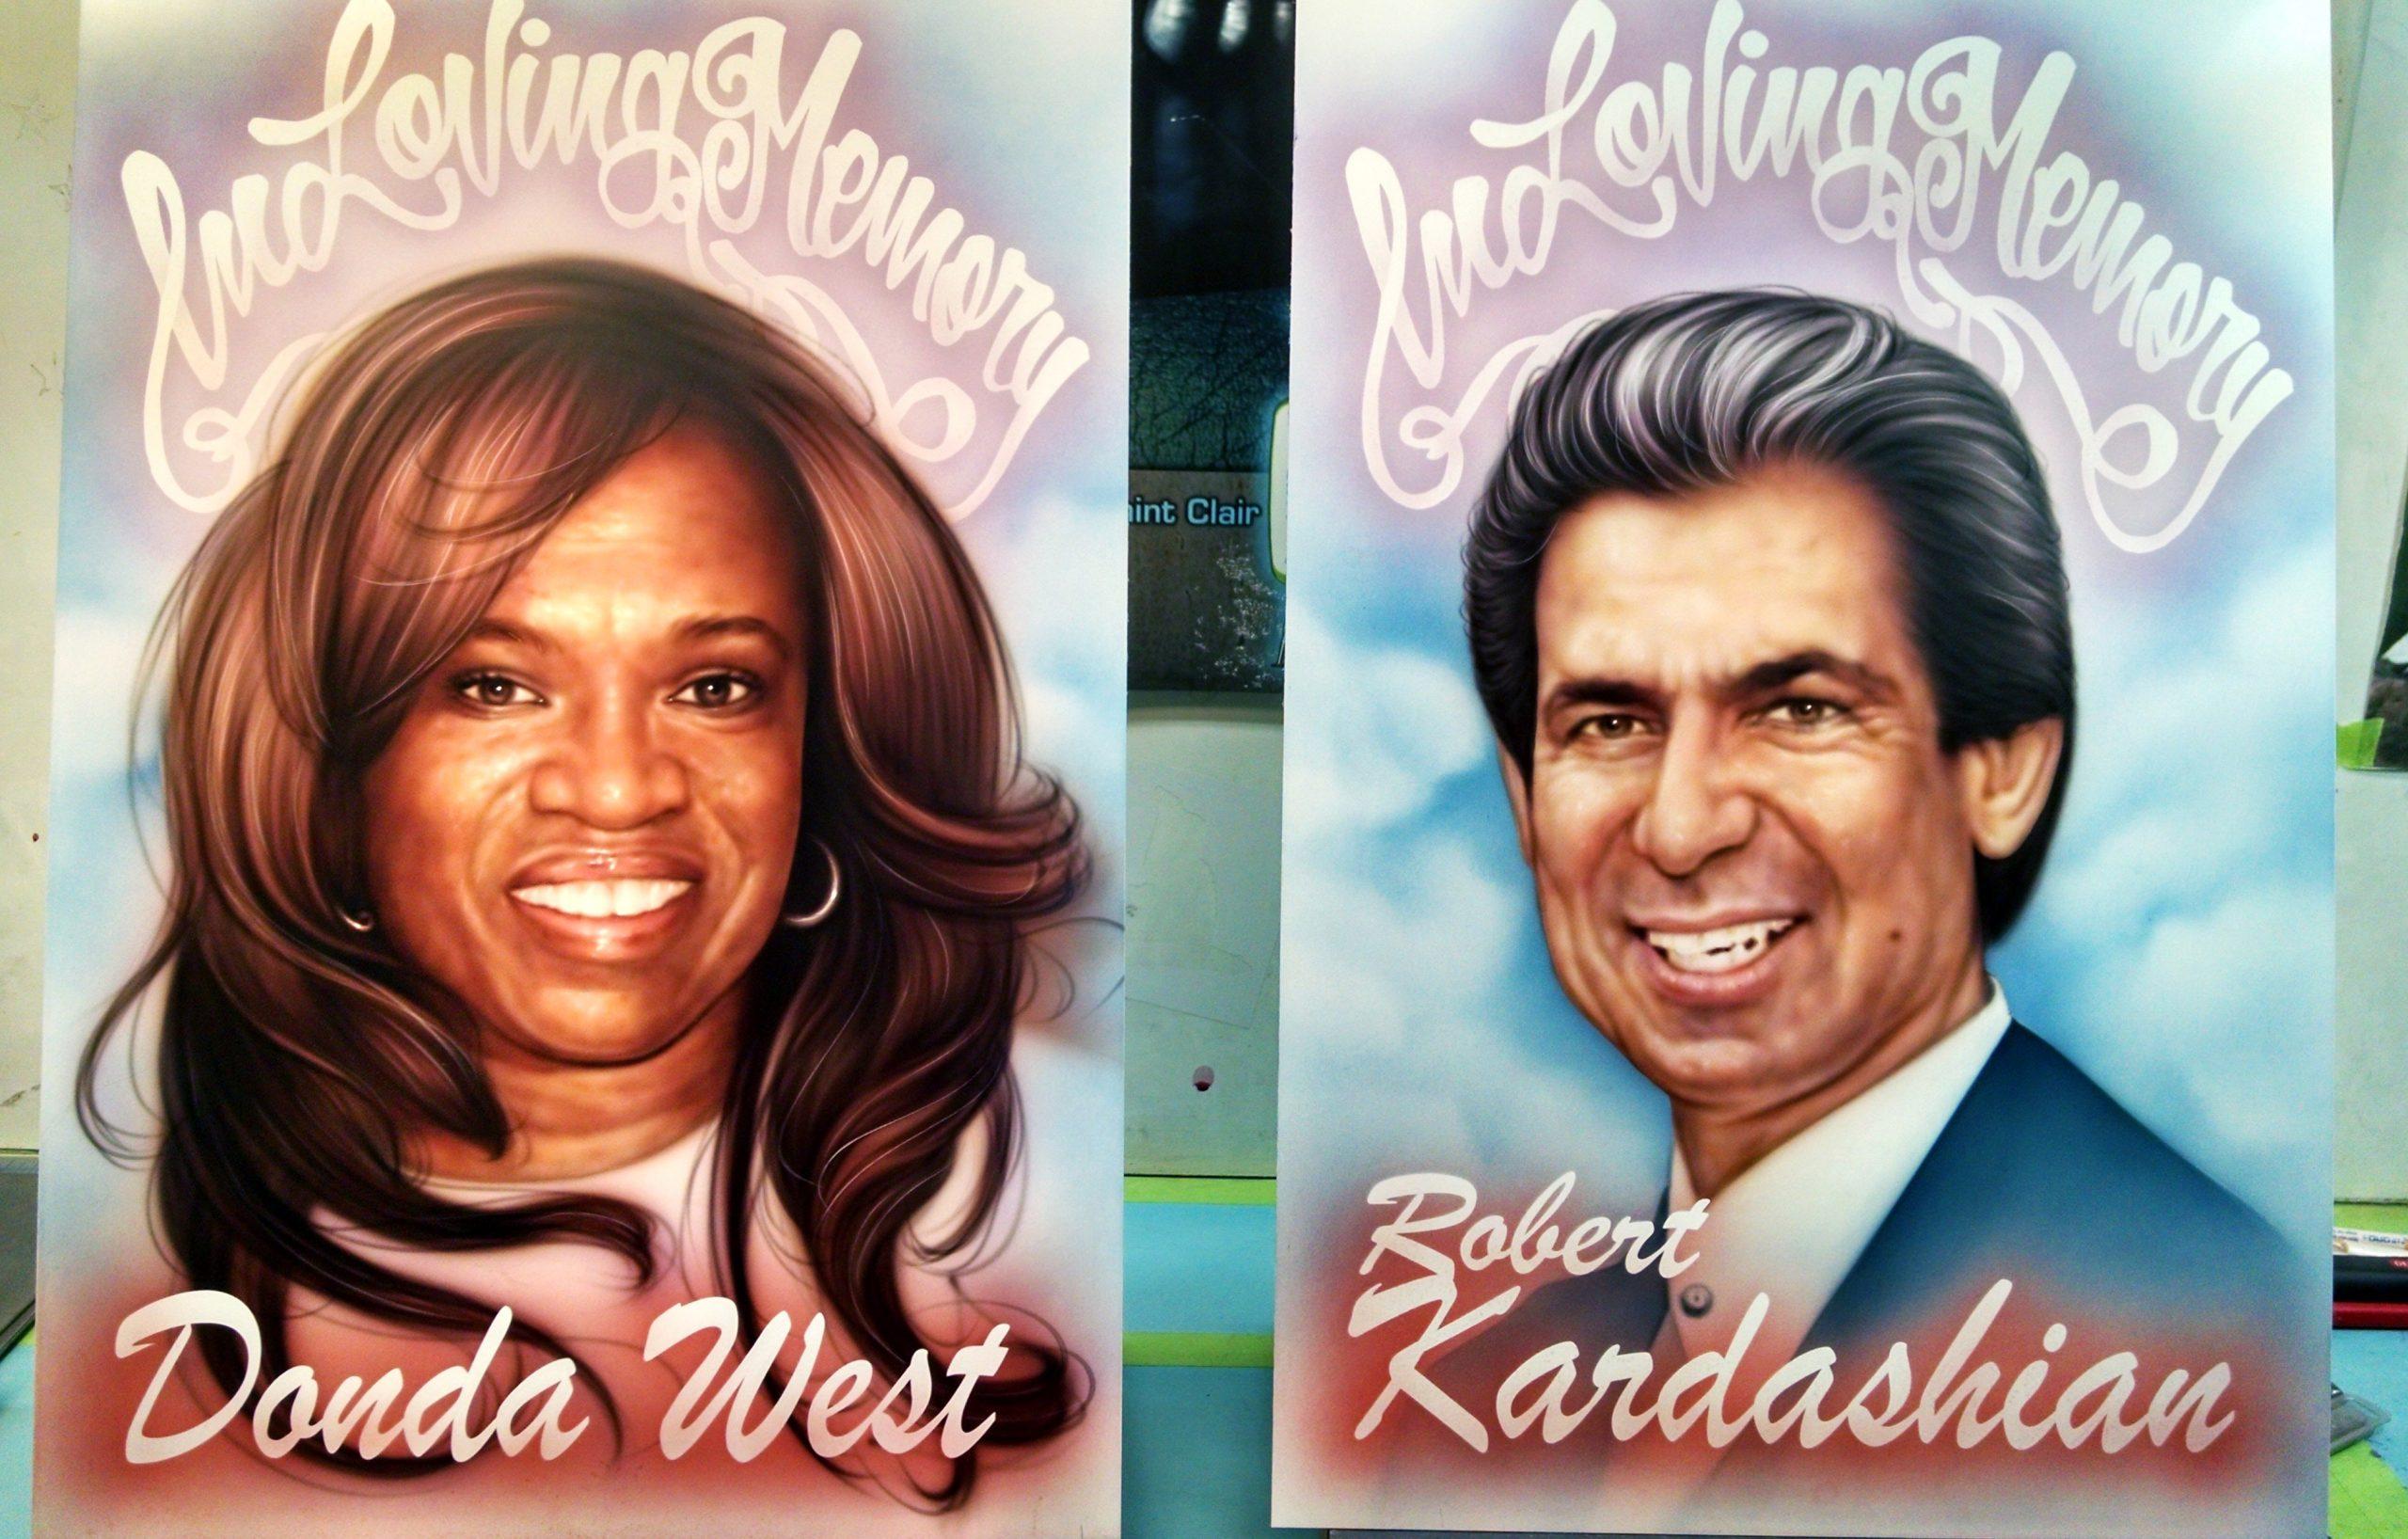 Kanye West Commemorating his Mother and Robert Kardashian